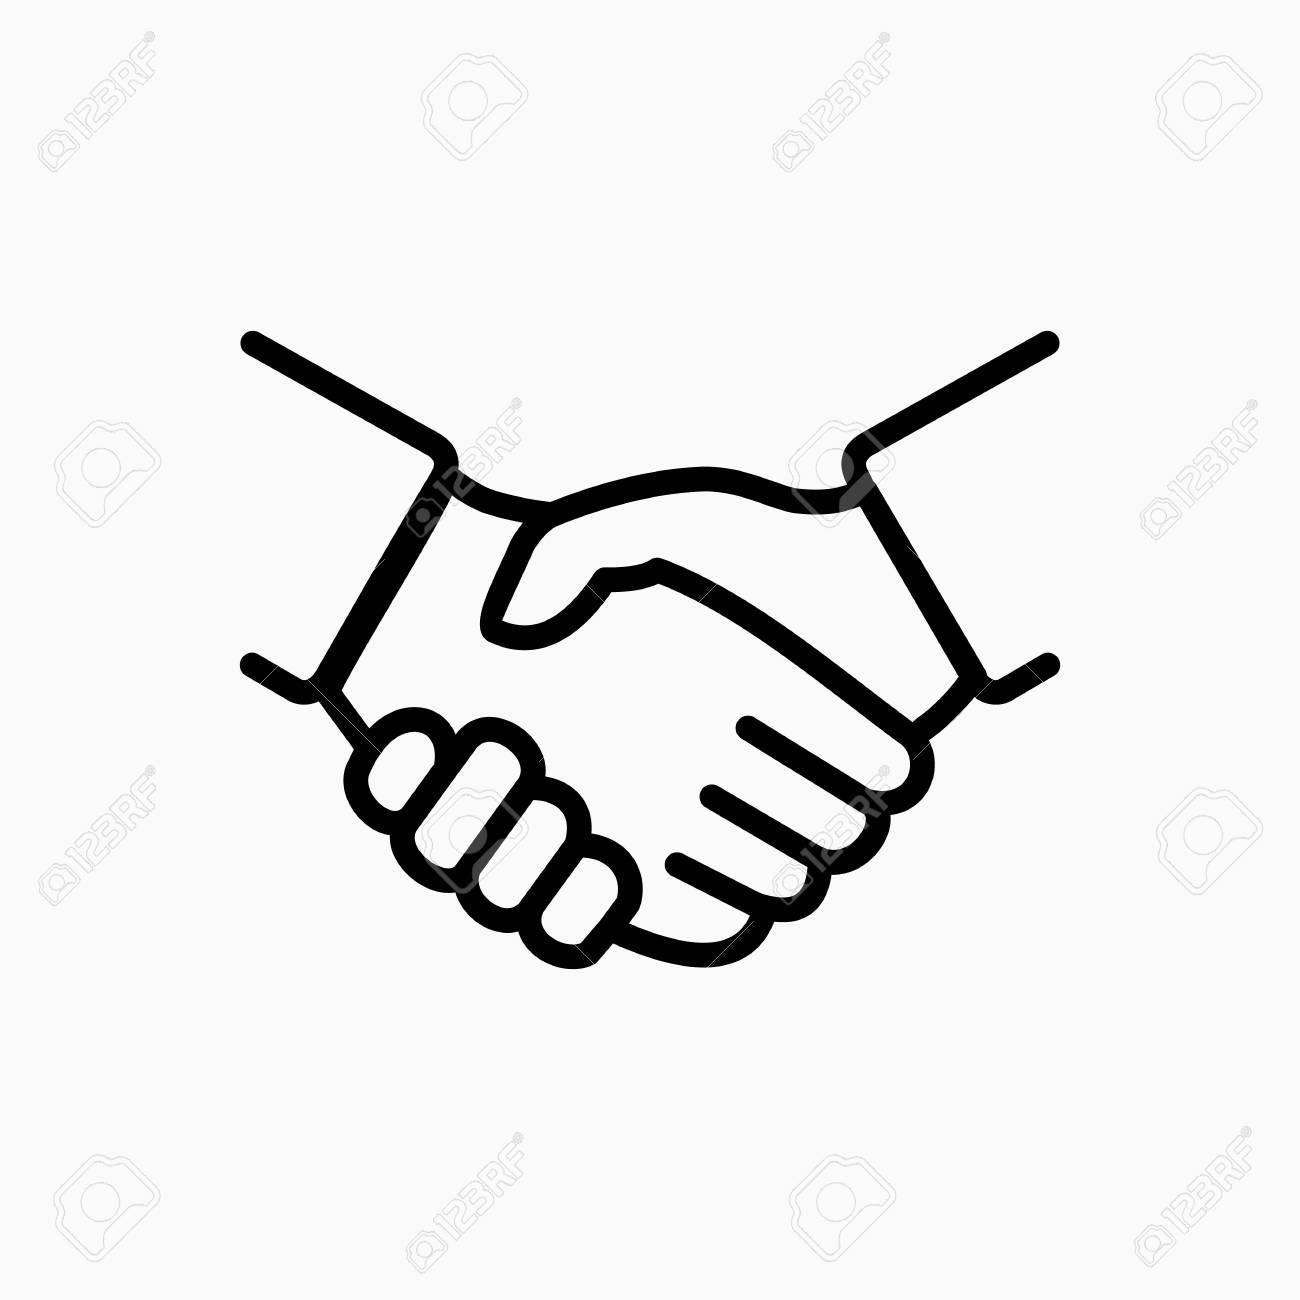 handshake icon simple vector illustration deal or partner agreement rh 123rf com vector handshake free download vector handshake free download